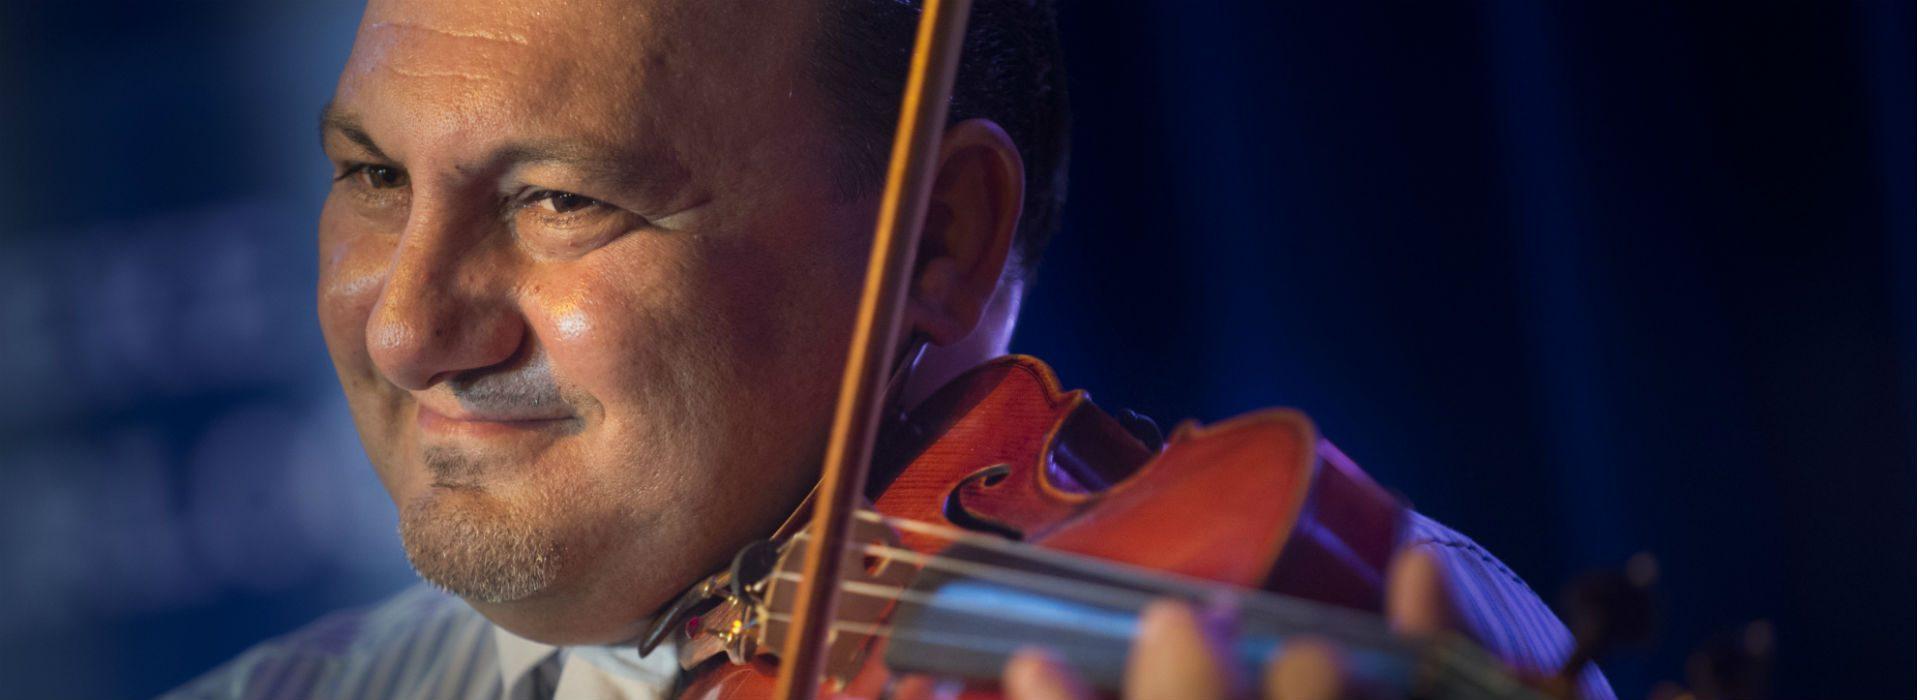 Vrijdag 1 november 2019 – Lajos Pádár – Wereldtop van de  Hongaarse Zigeunermuziek uit Boedapest